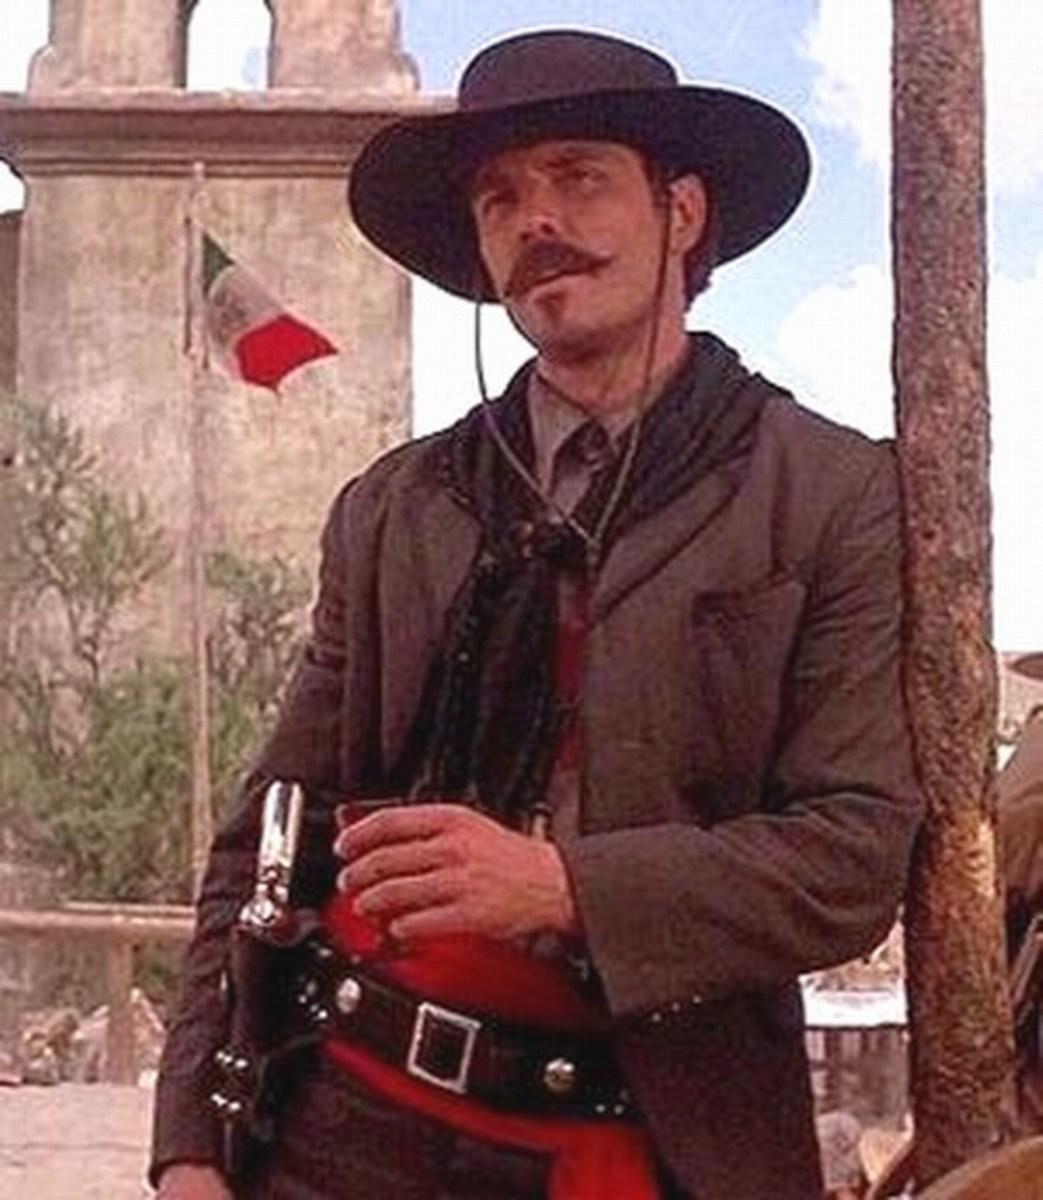 Michael Biehn as Johnny Ringo in Tombstone